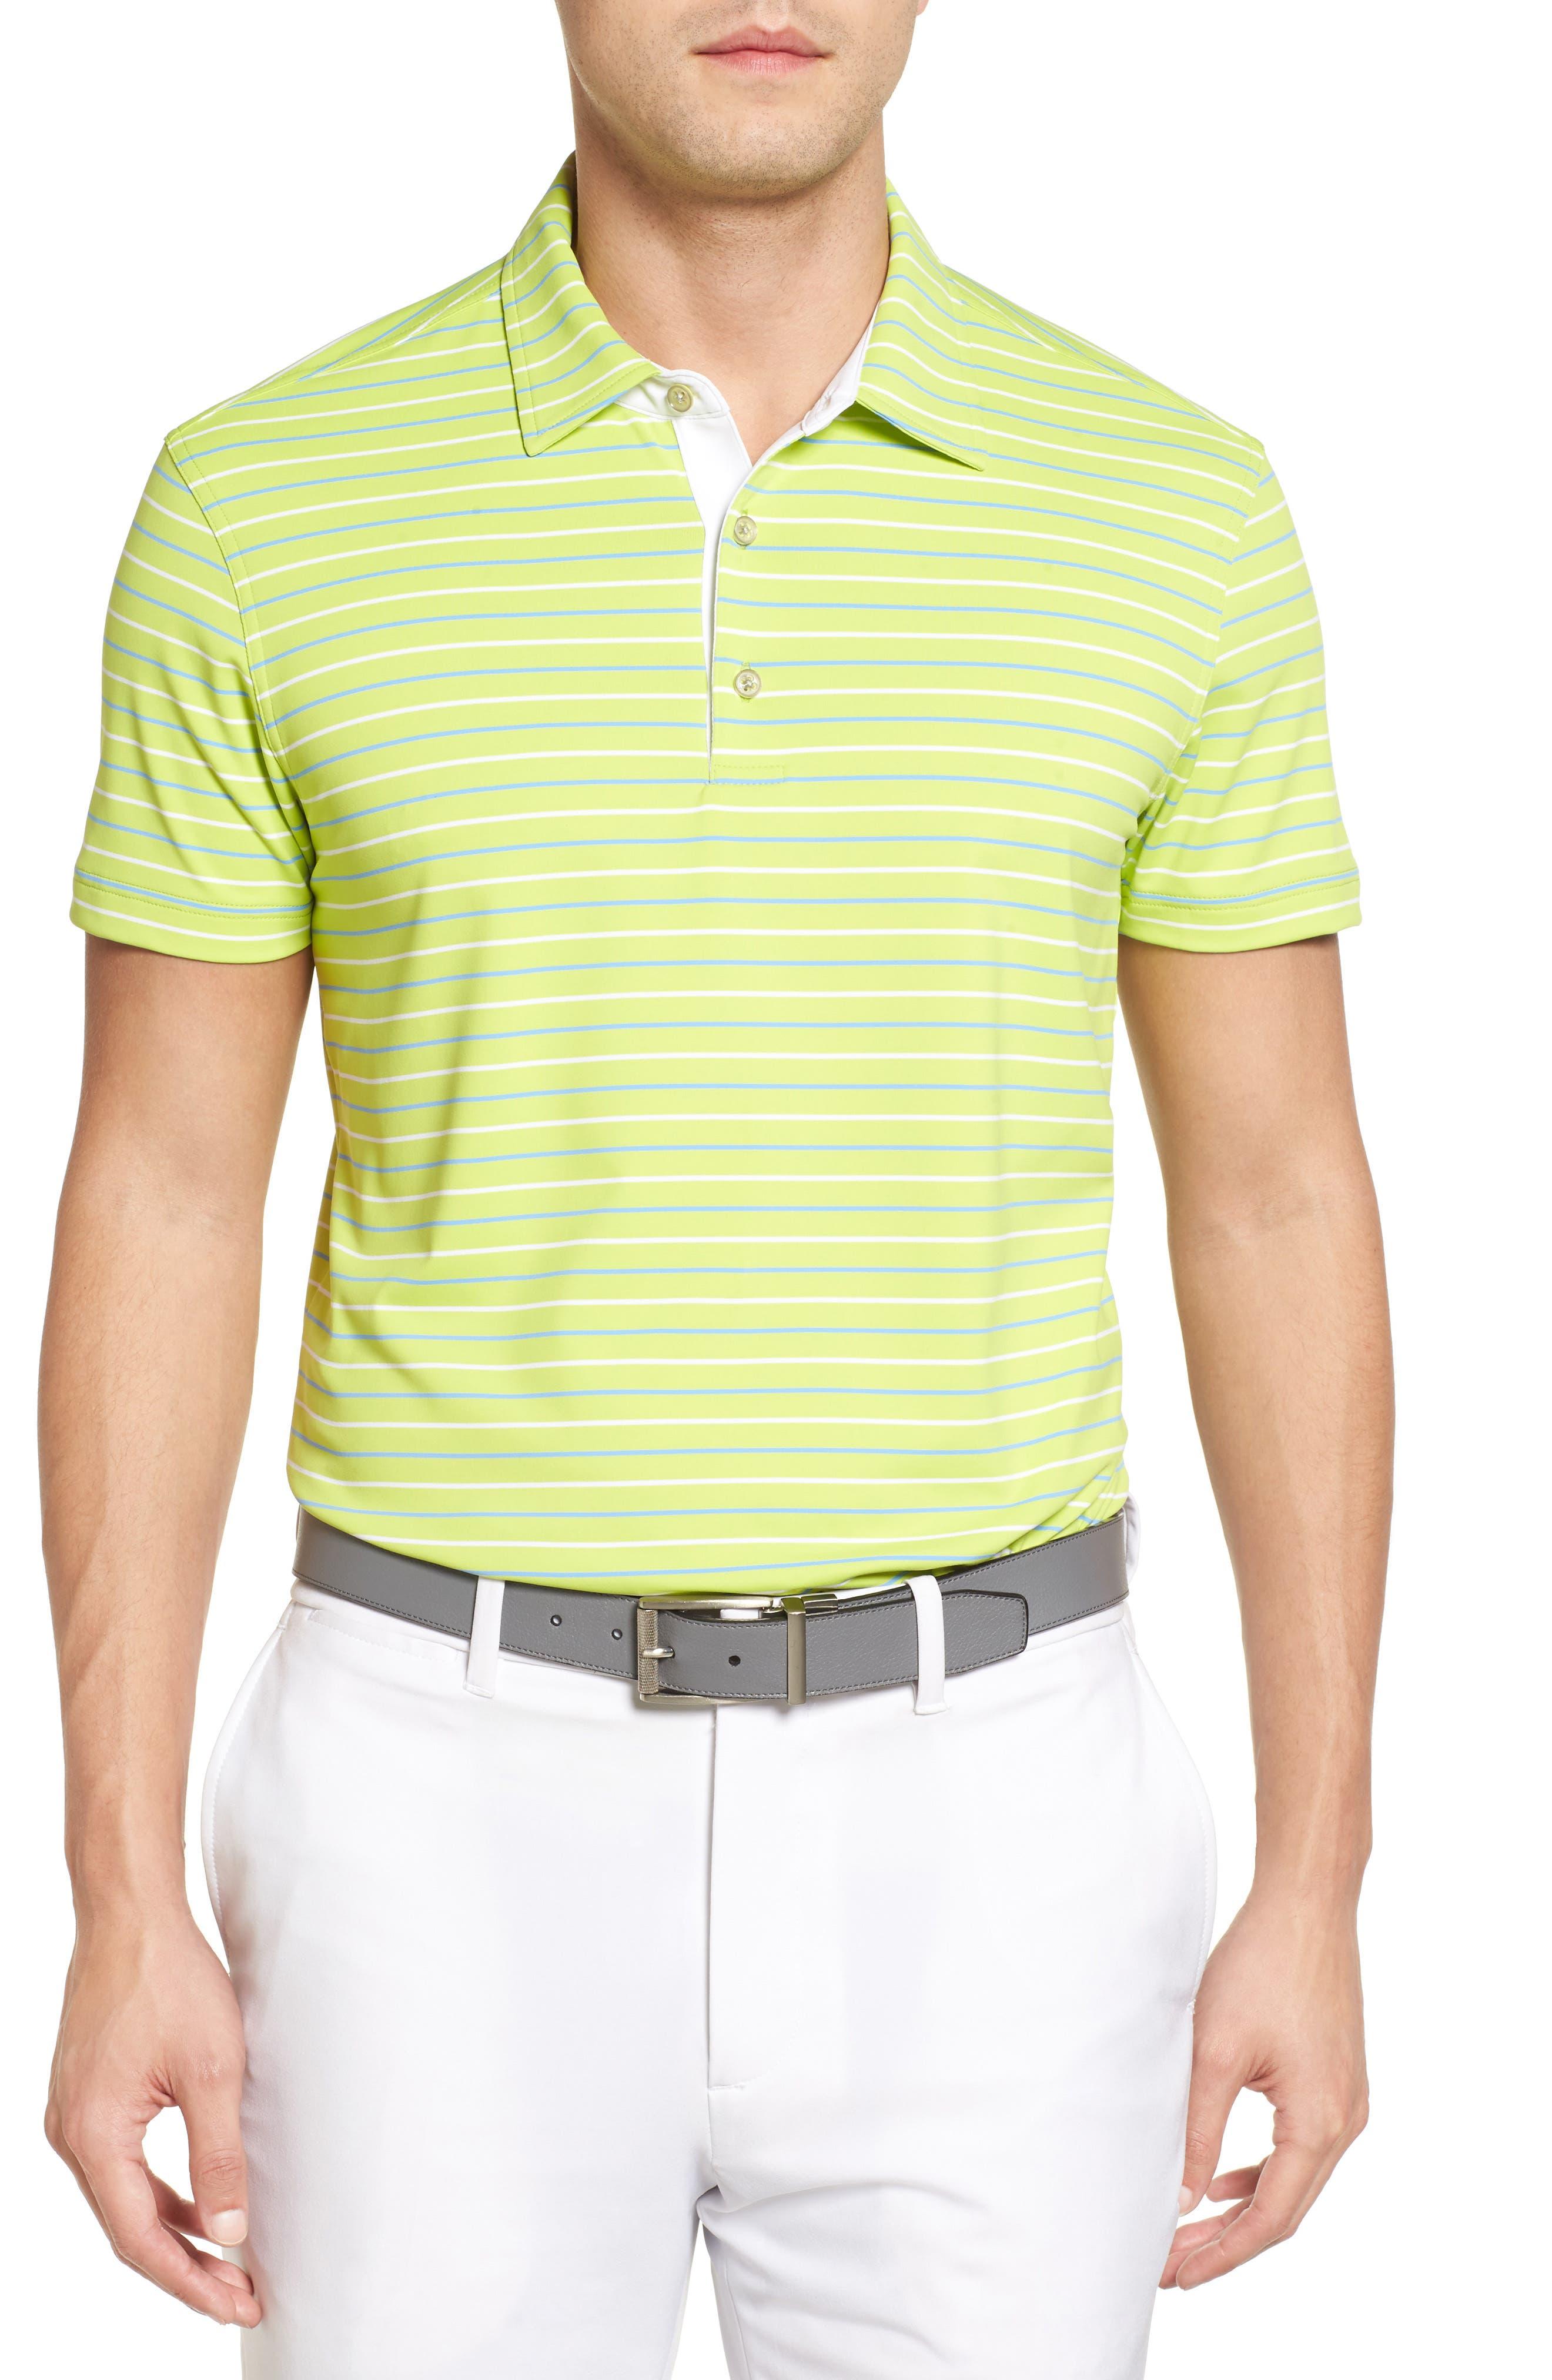 Bobby Jones File Tech Stripe Golf Polo